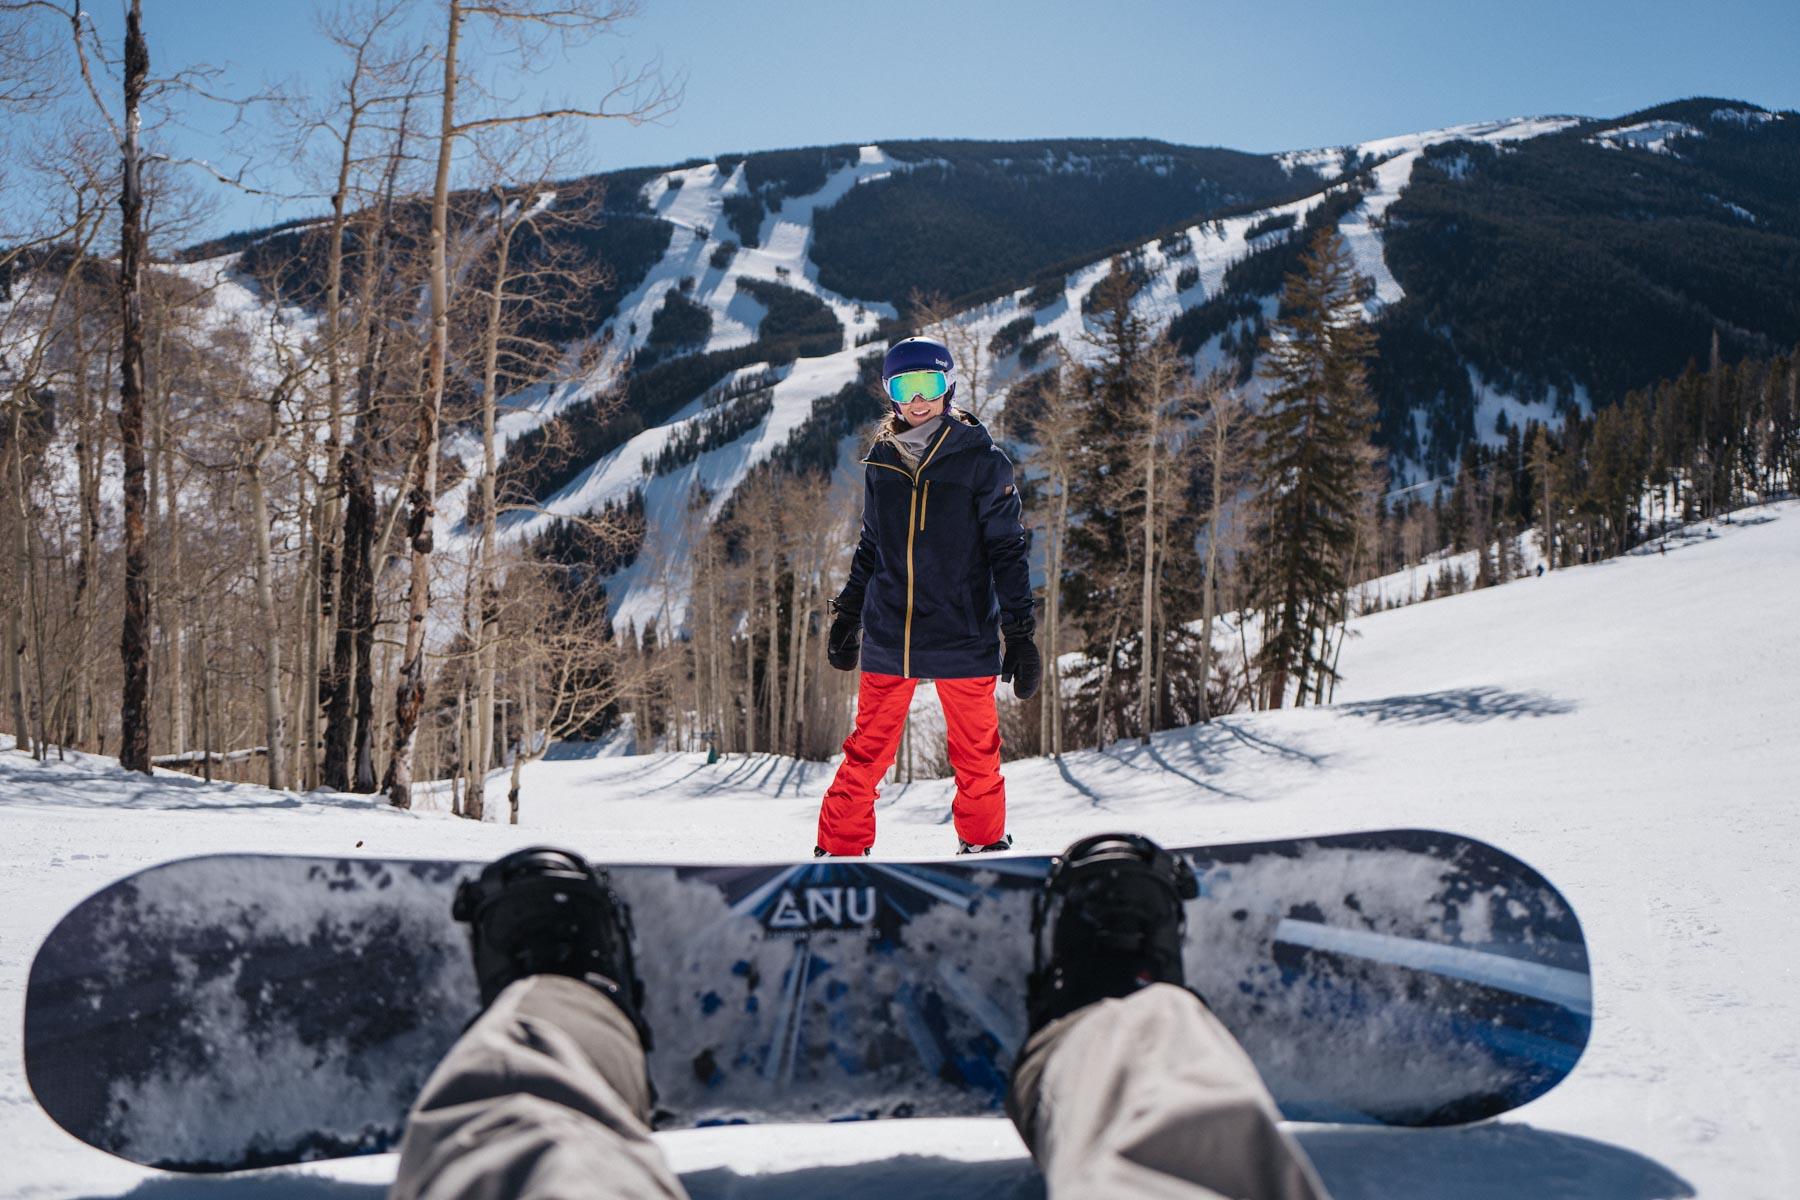 Jess Ann Kirby spends time snowboarding at Beaver Creek Colorado